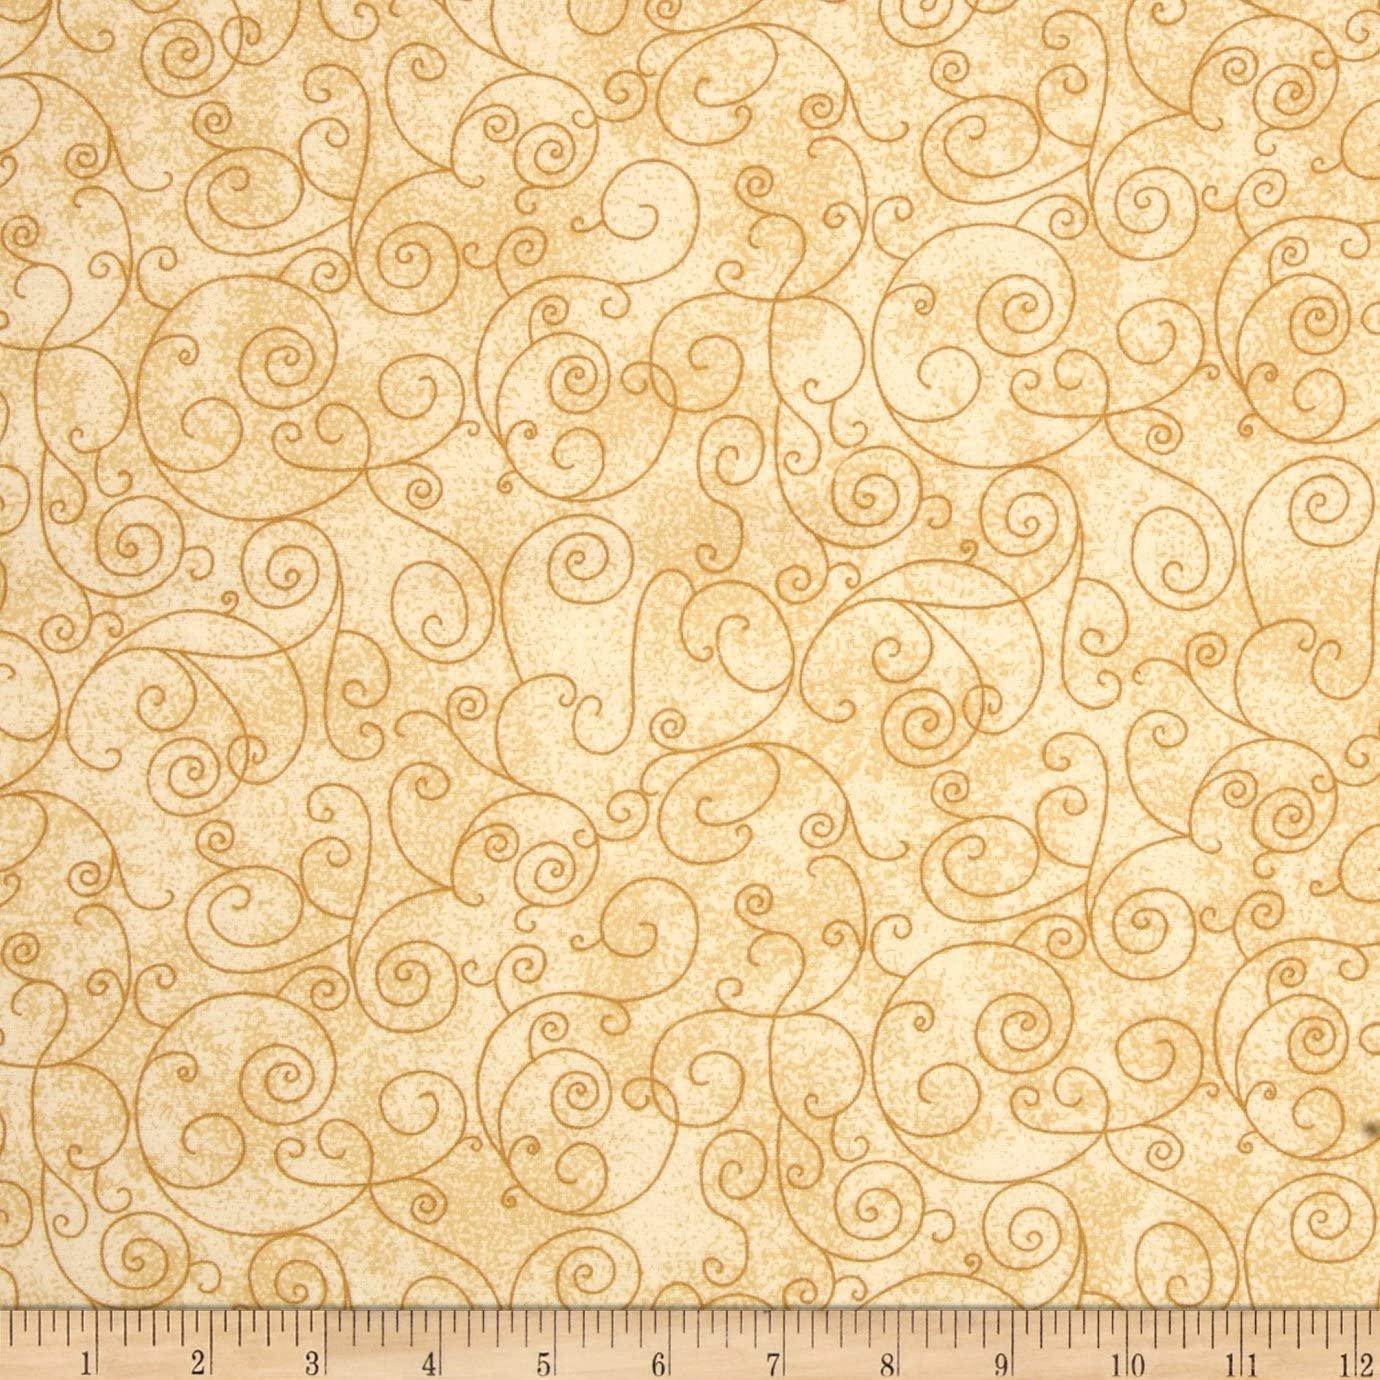 110 Willow Flannel Backing Tan Swirl